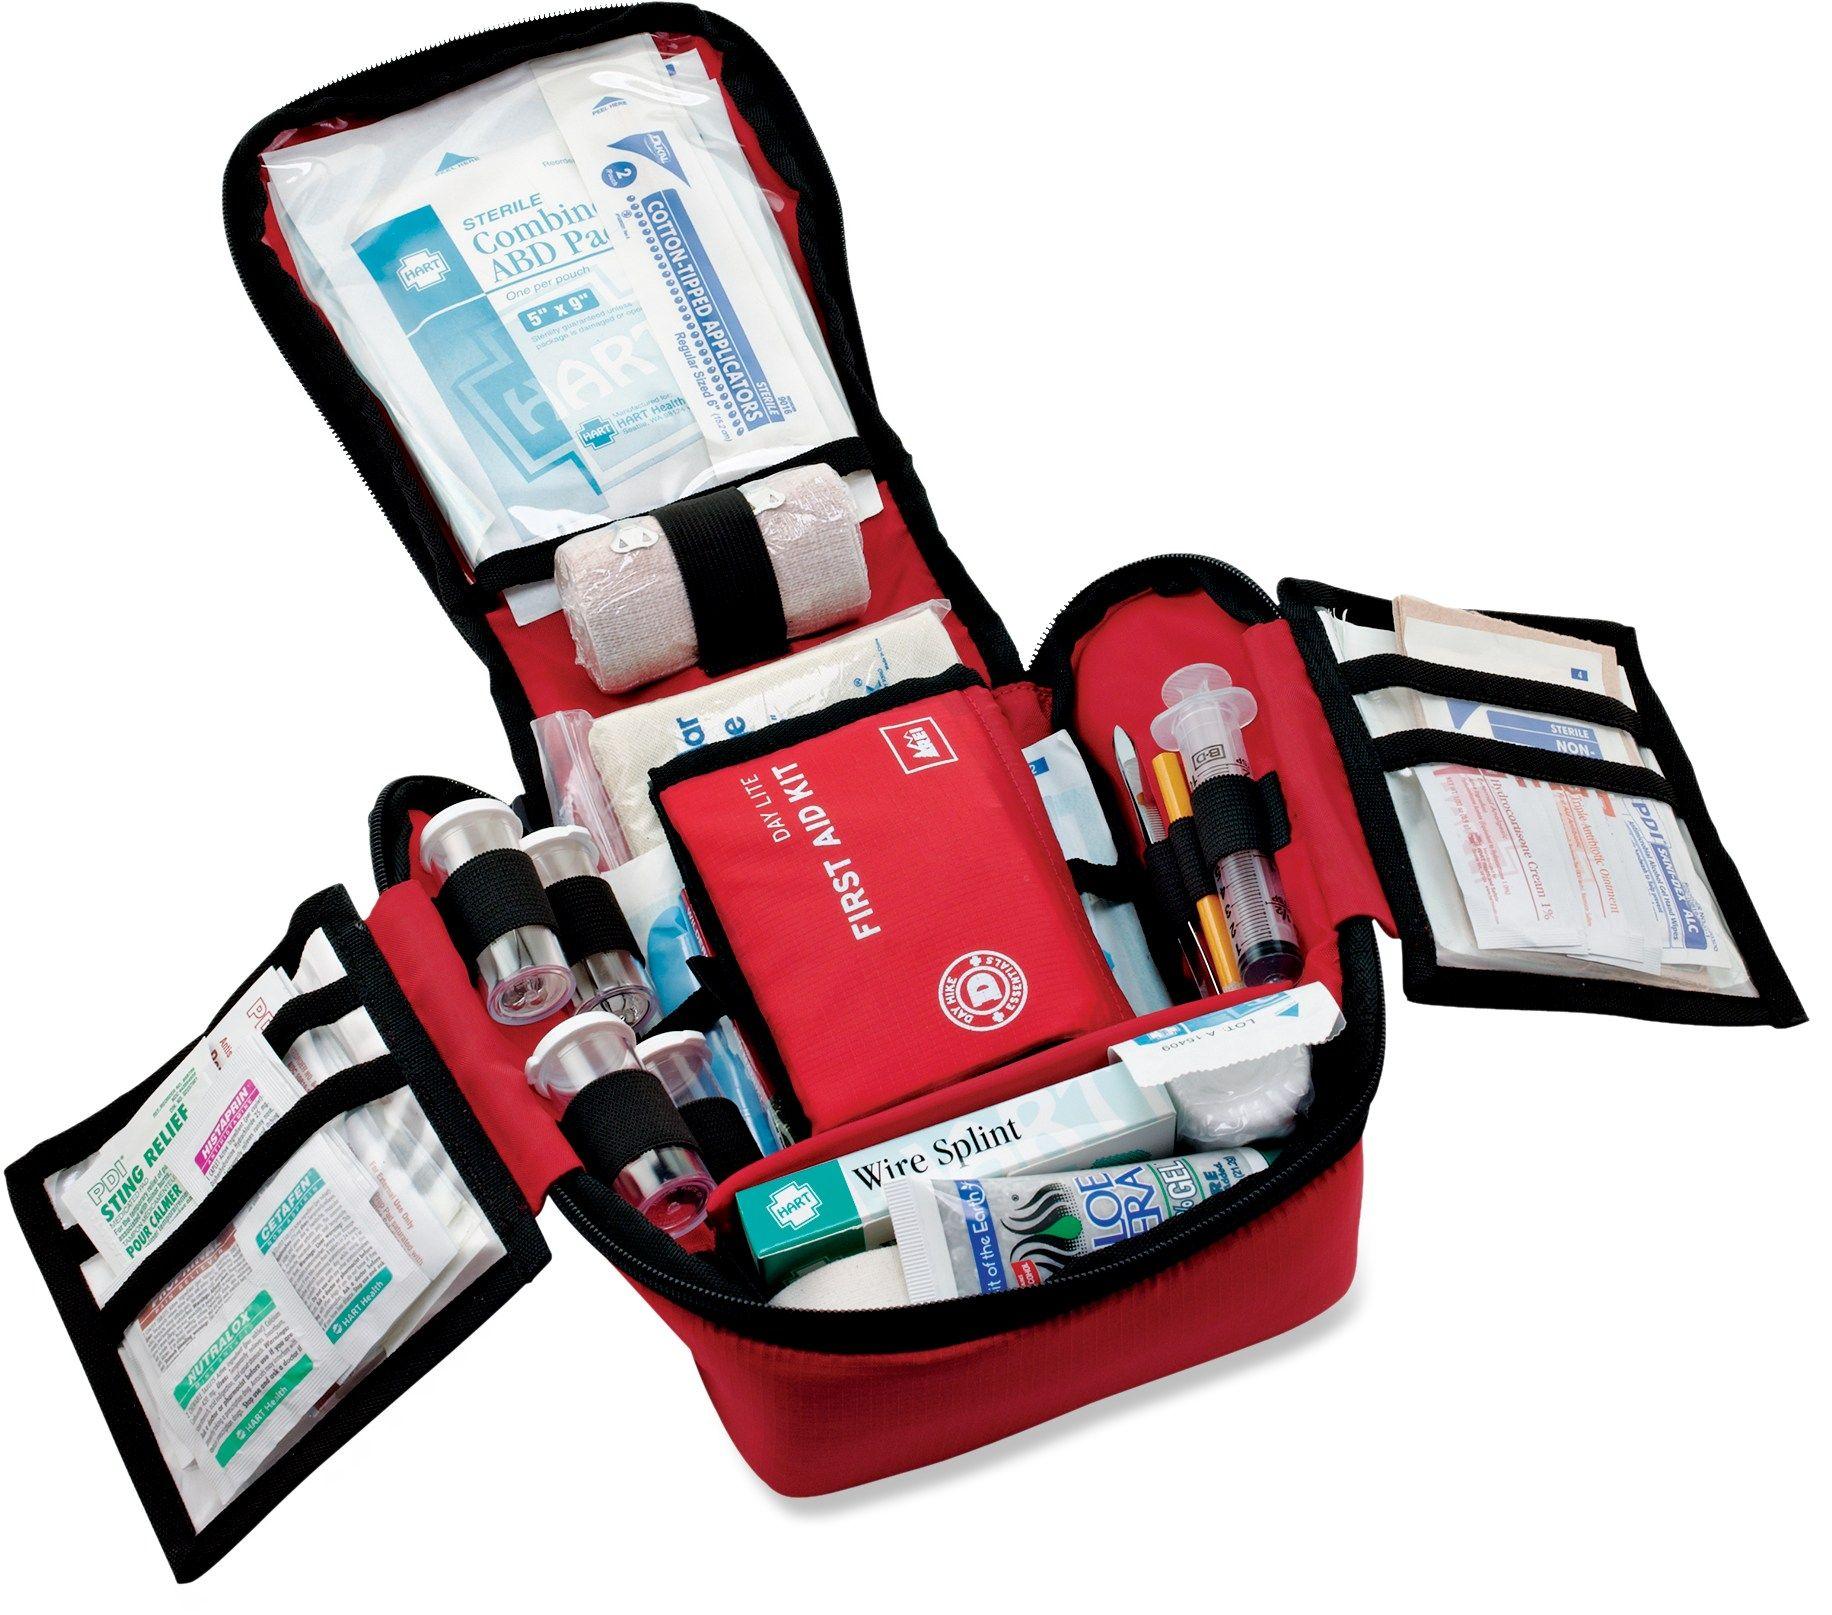 Coop Backpacker Plus Extended FirstAid Kit REI Coop